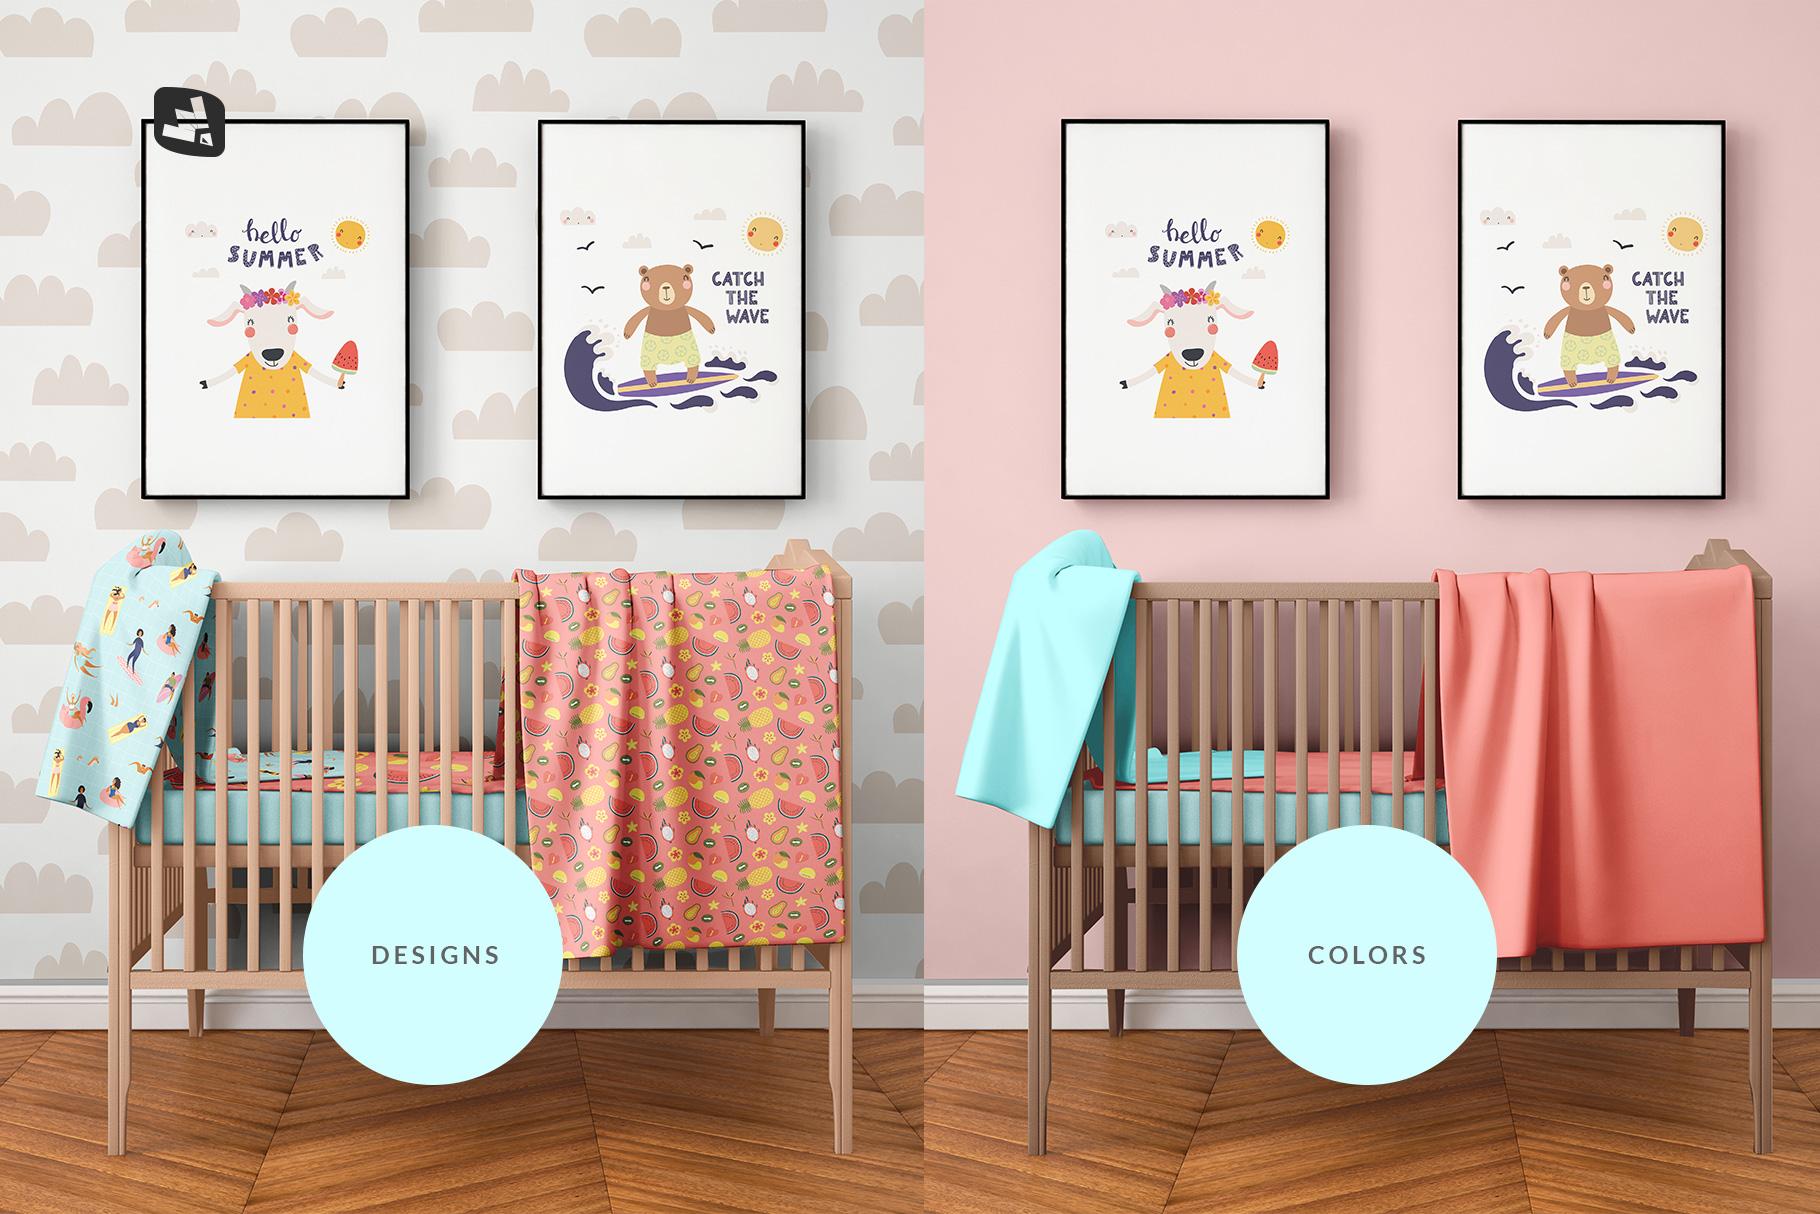 types of the nursery interior mockup